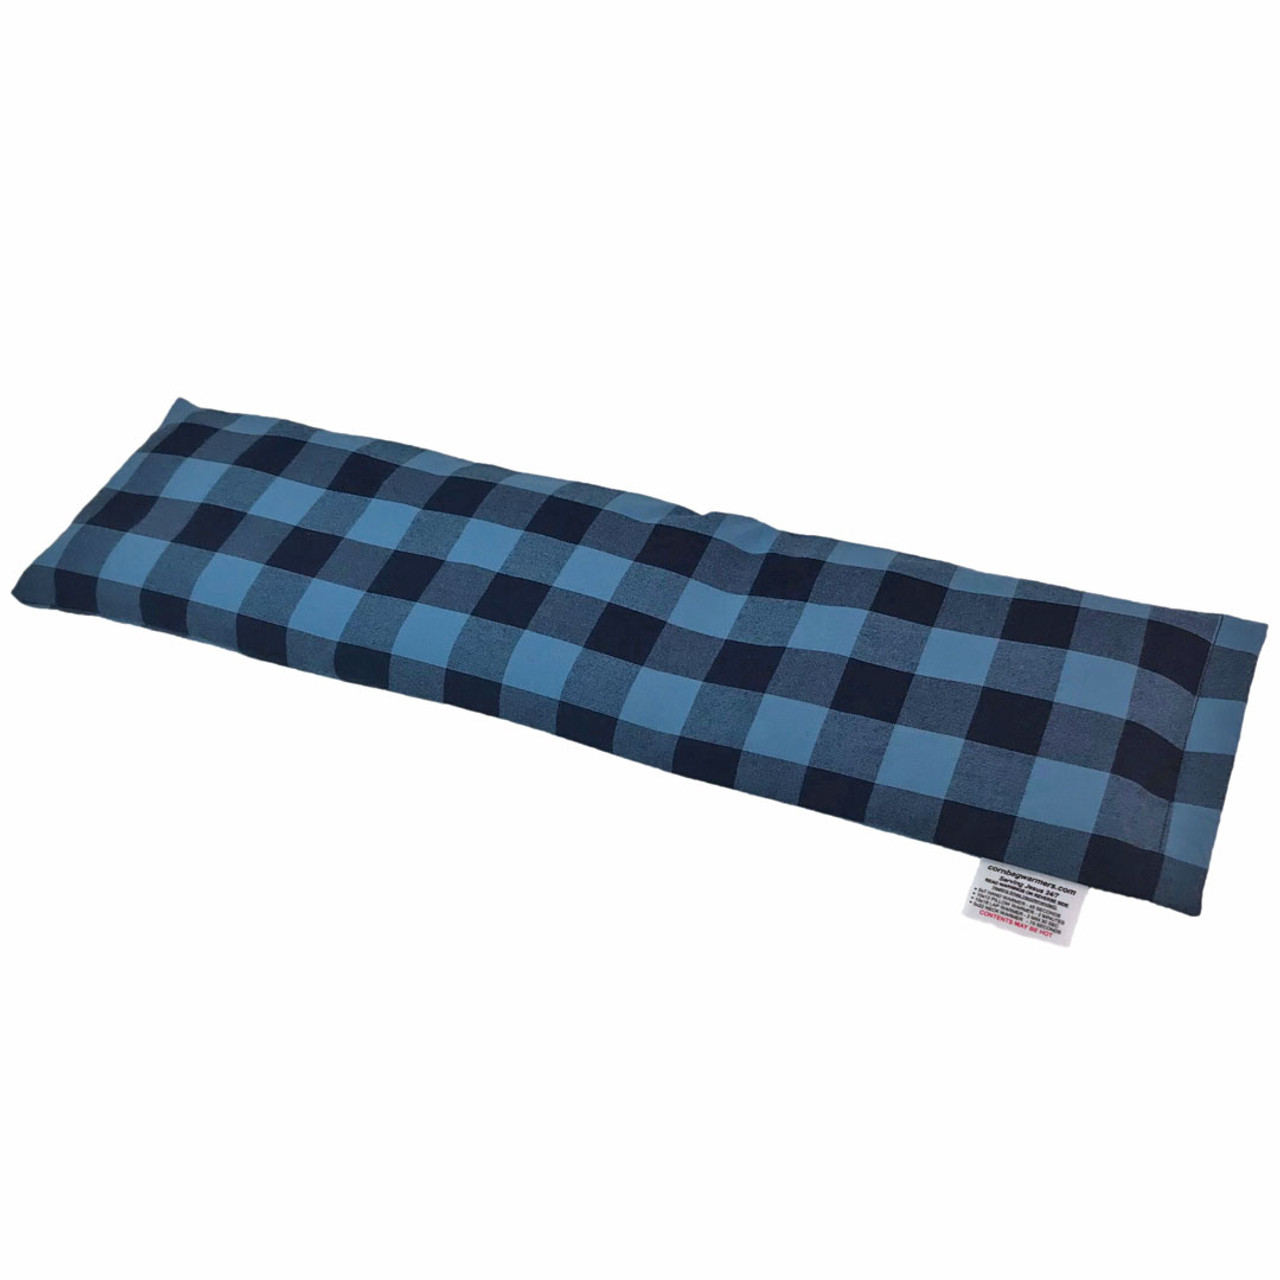 Light Blue & Black Plaid Neck Warmer Corn Bag Warmer - for Neck Pain. Beautiful!